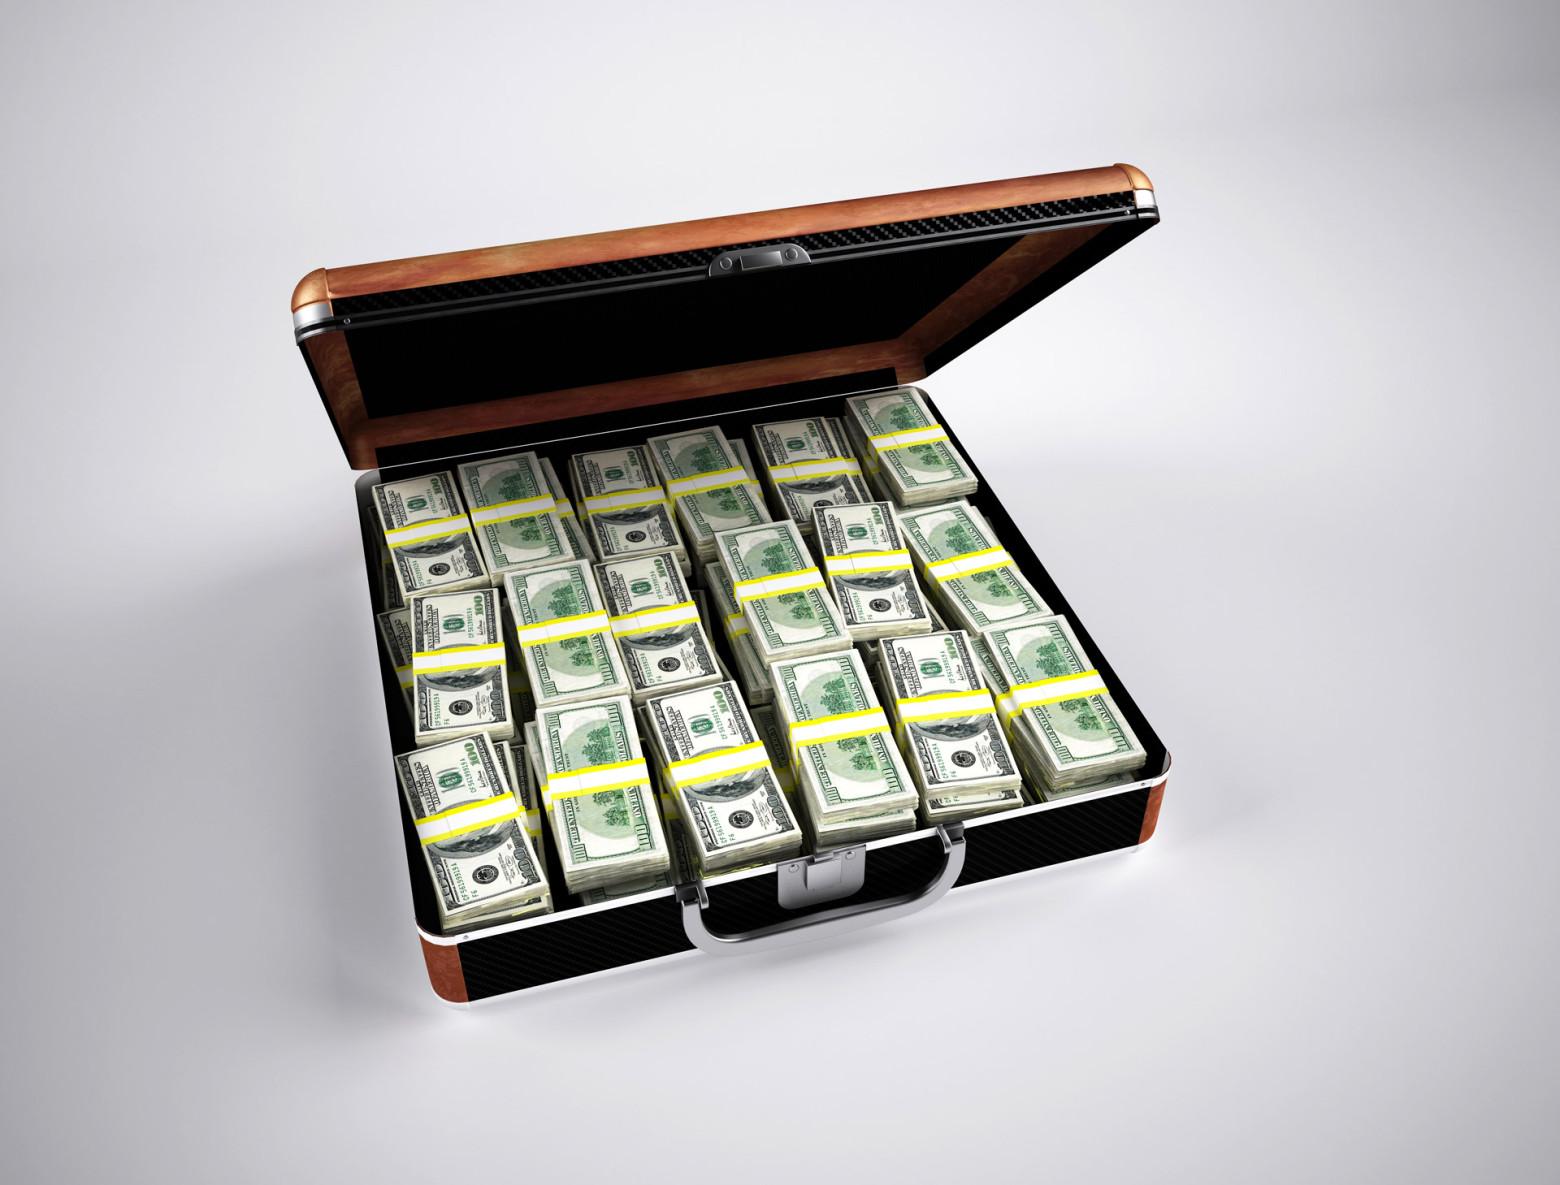 valise-billet-dollar-1560x1185.jpg